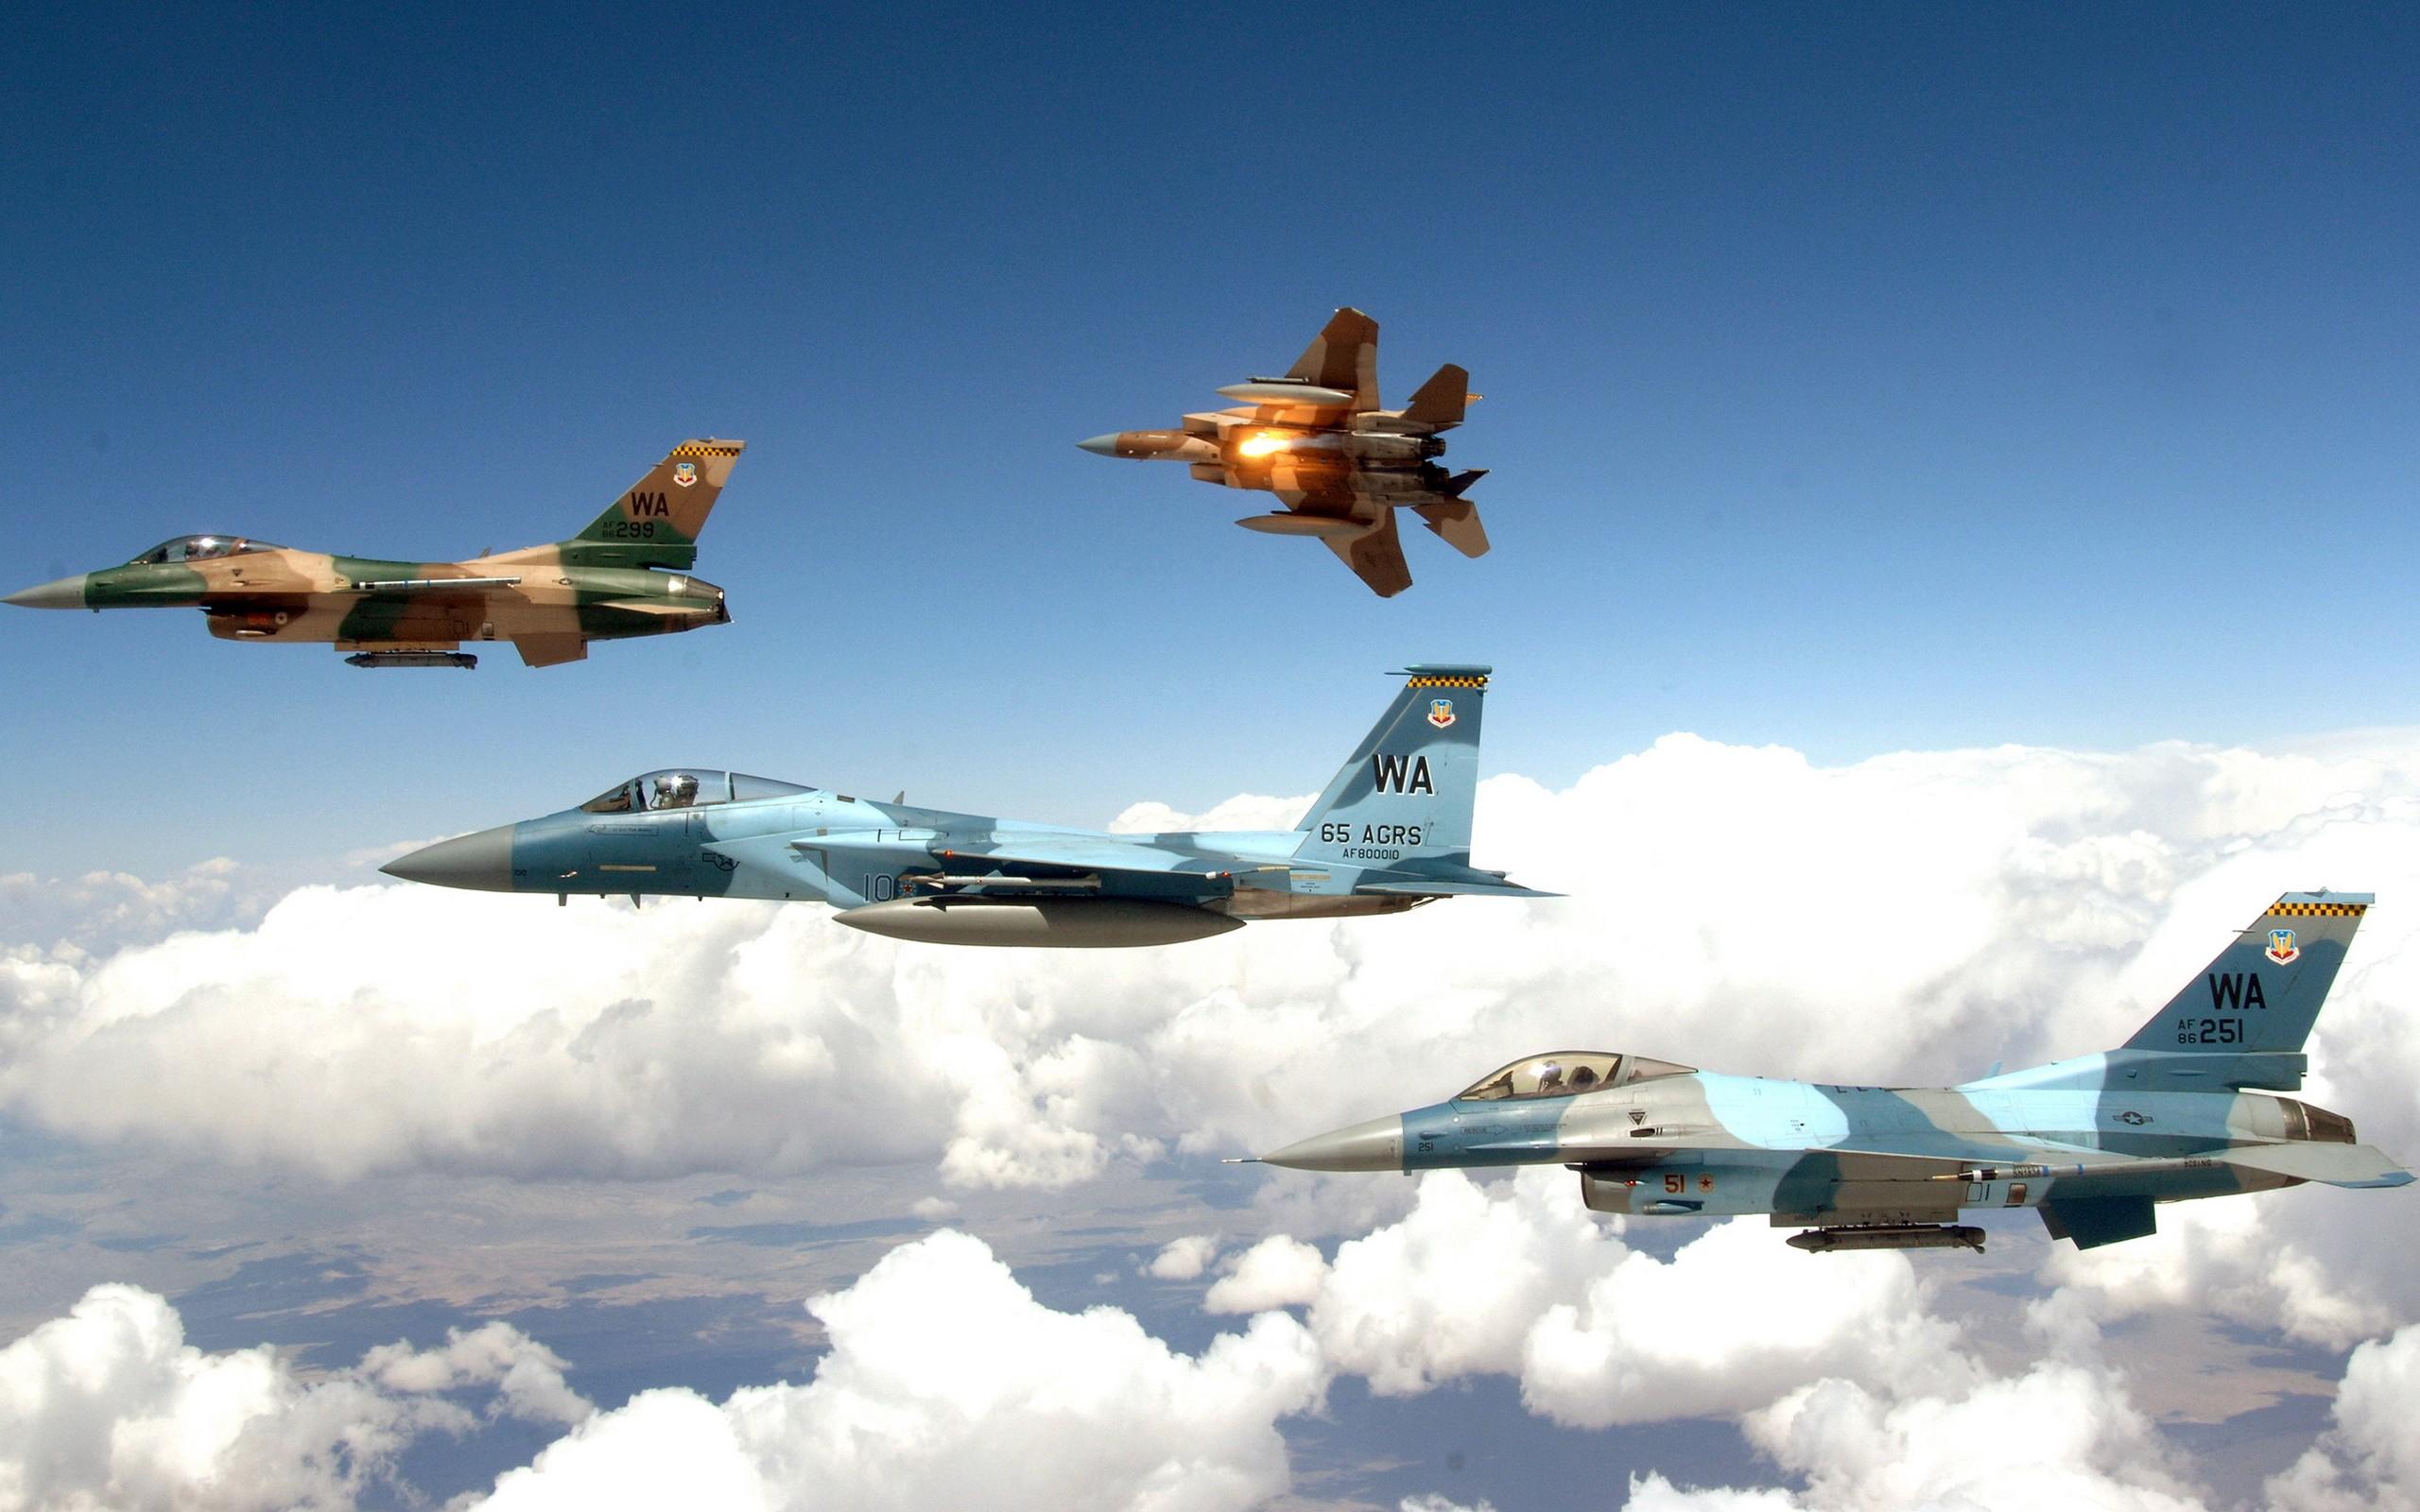 Wallpaper : vehicle, airplane, General Dynamics F 16